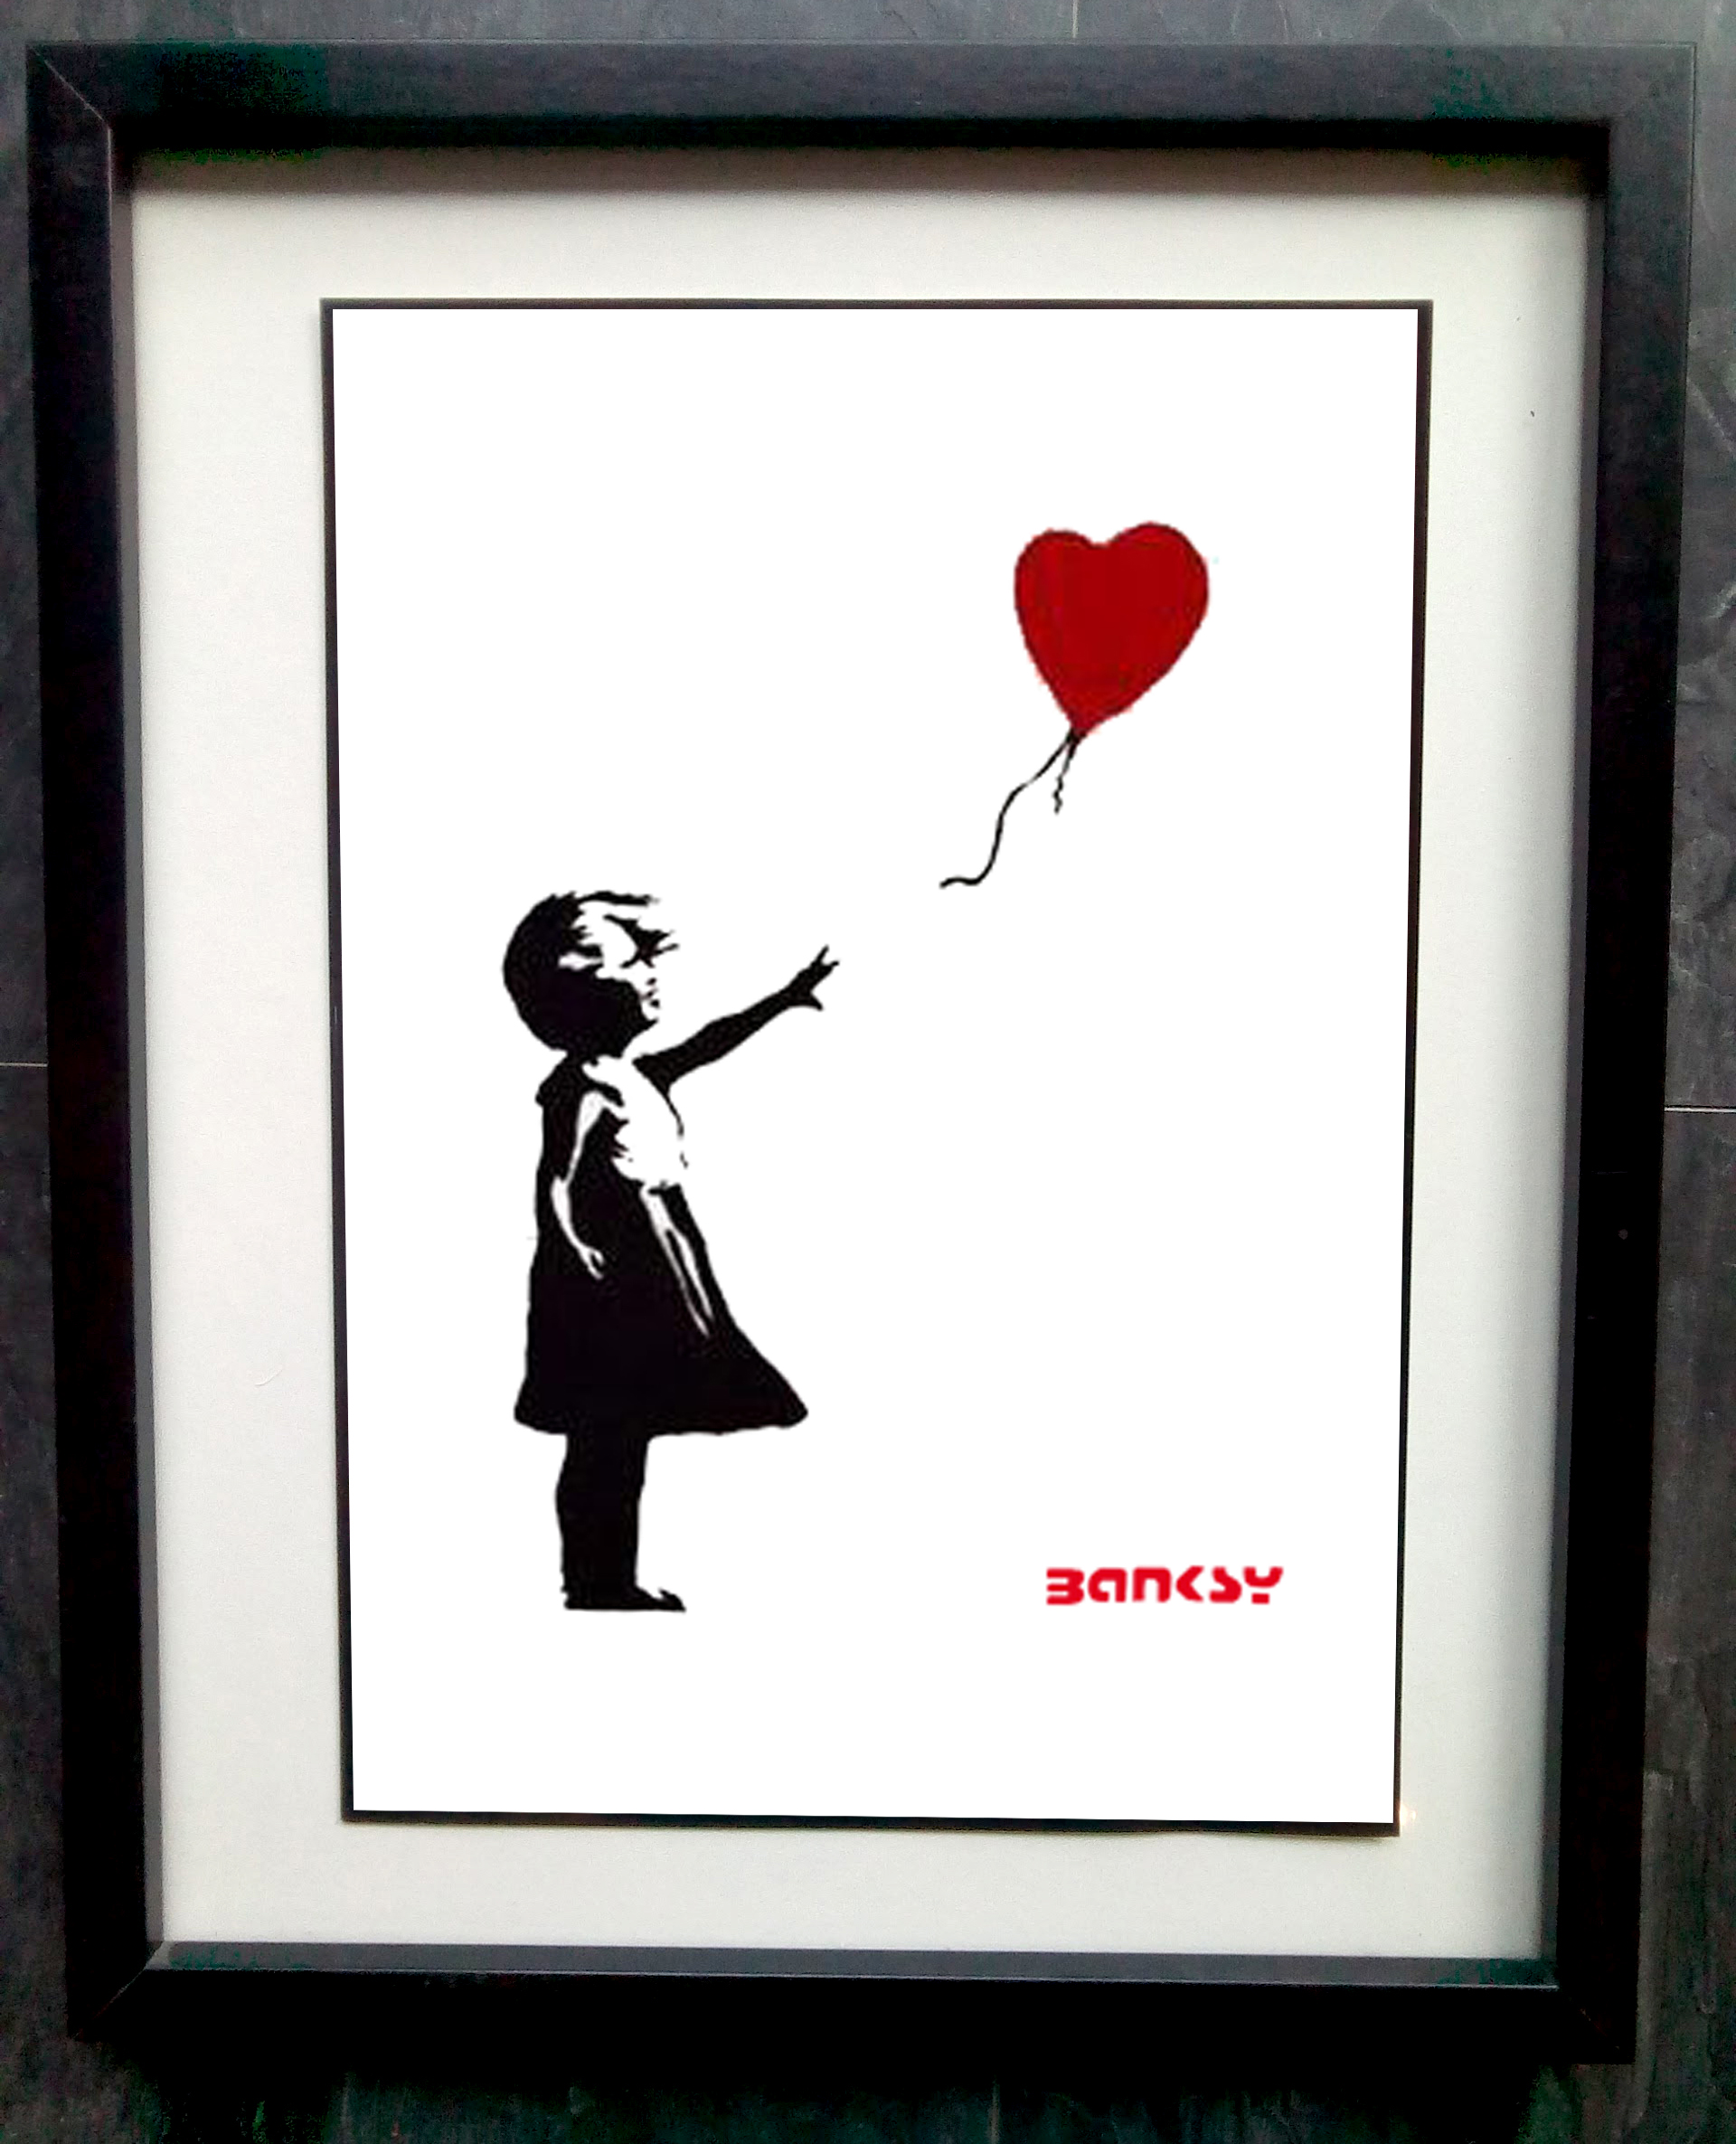 Balloon Heart A3 A4 Poster Print Banksy